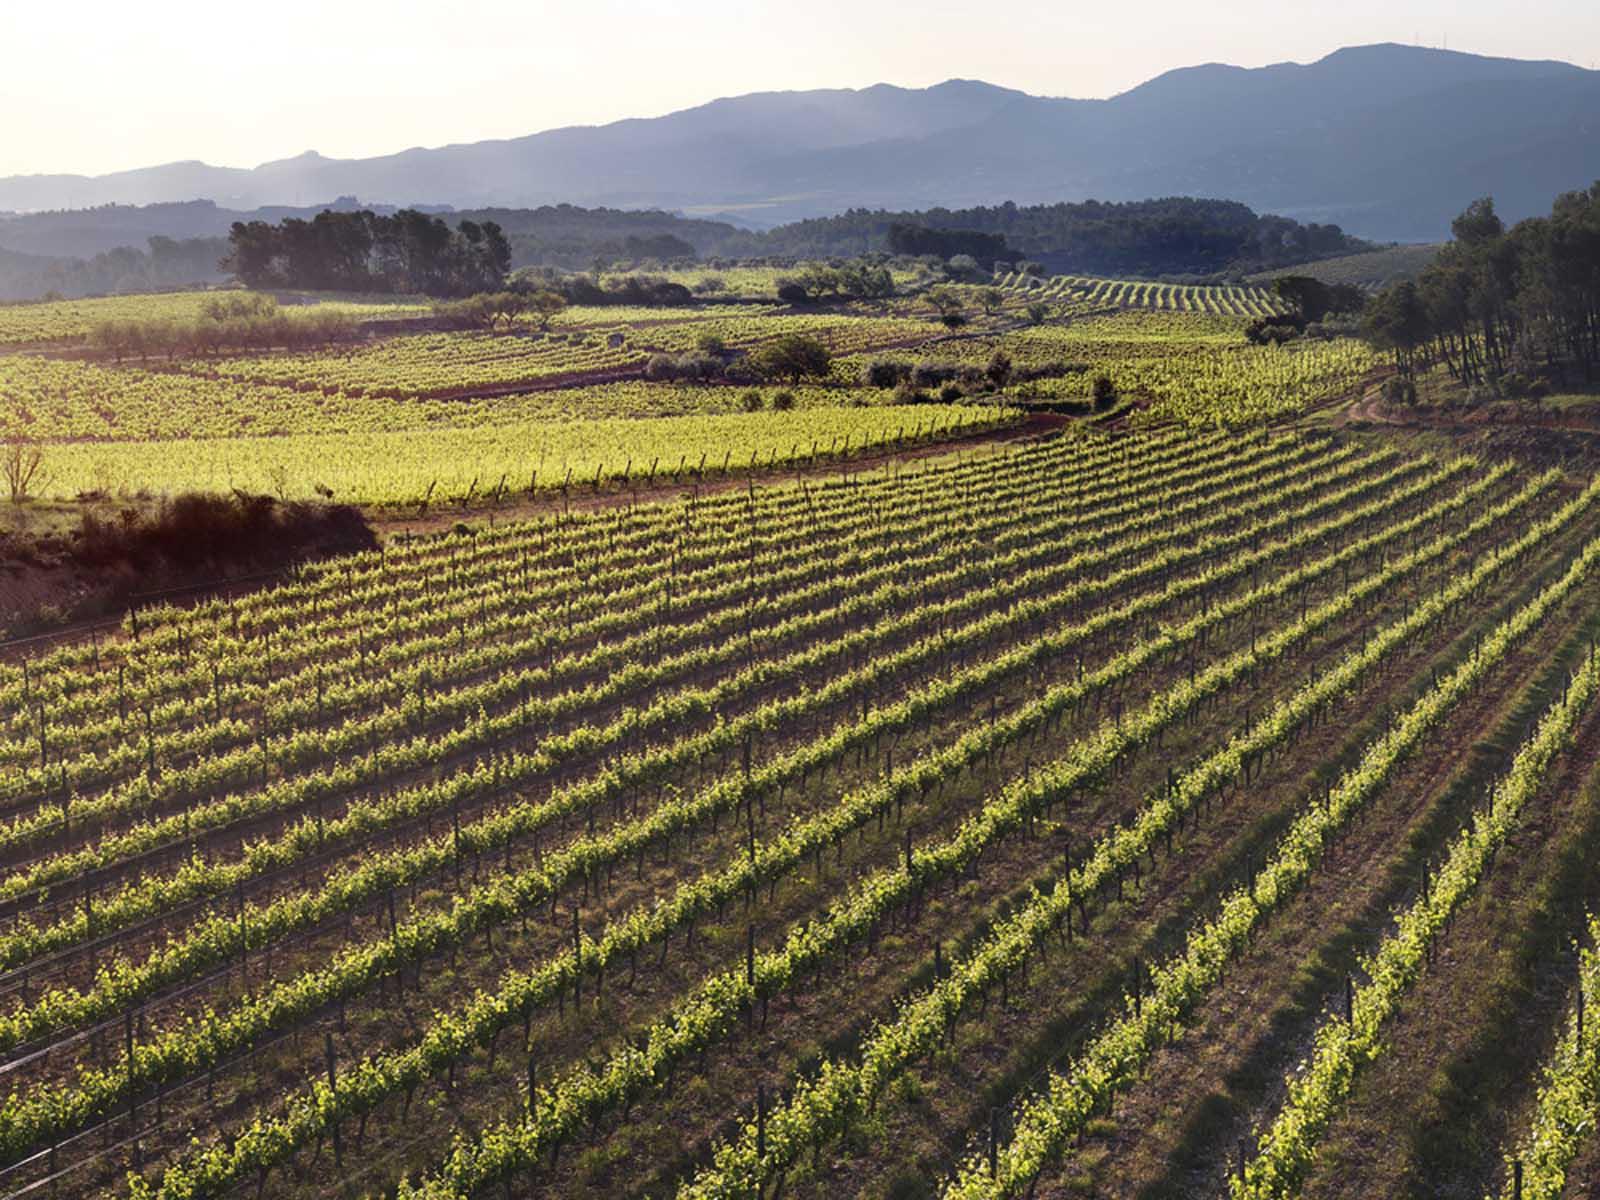 Vinyes de Sant Sadurní d'Anoia. FOTO: Cedida